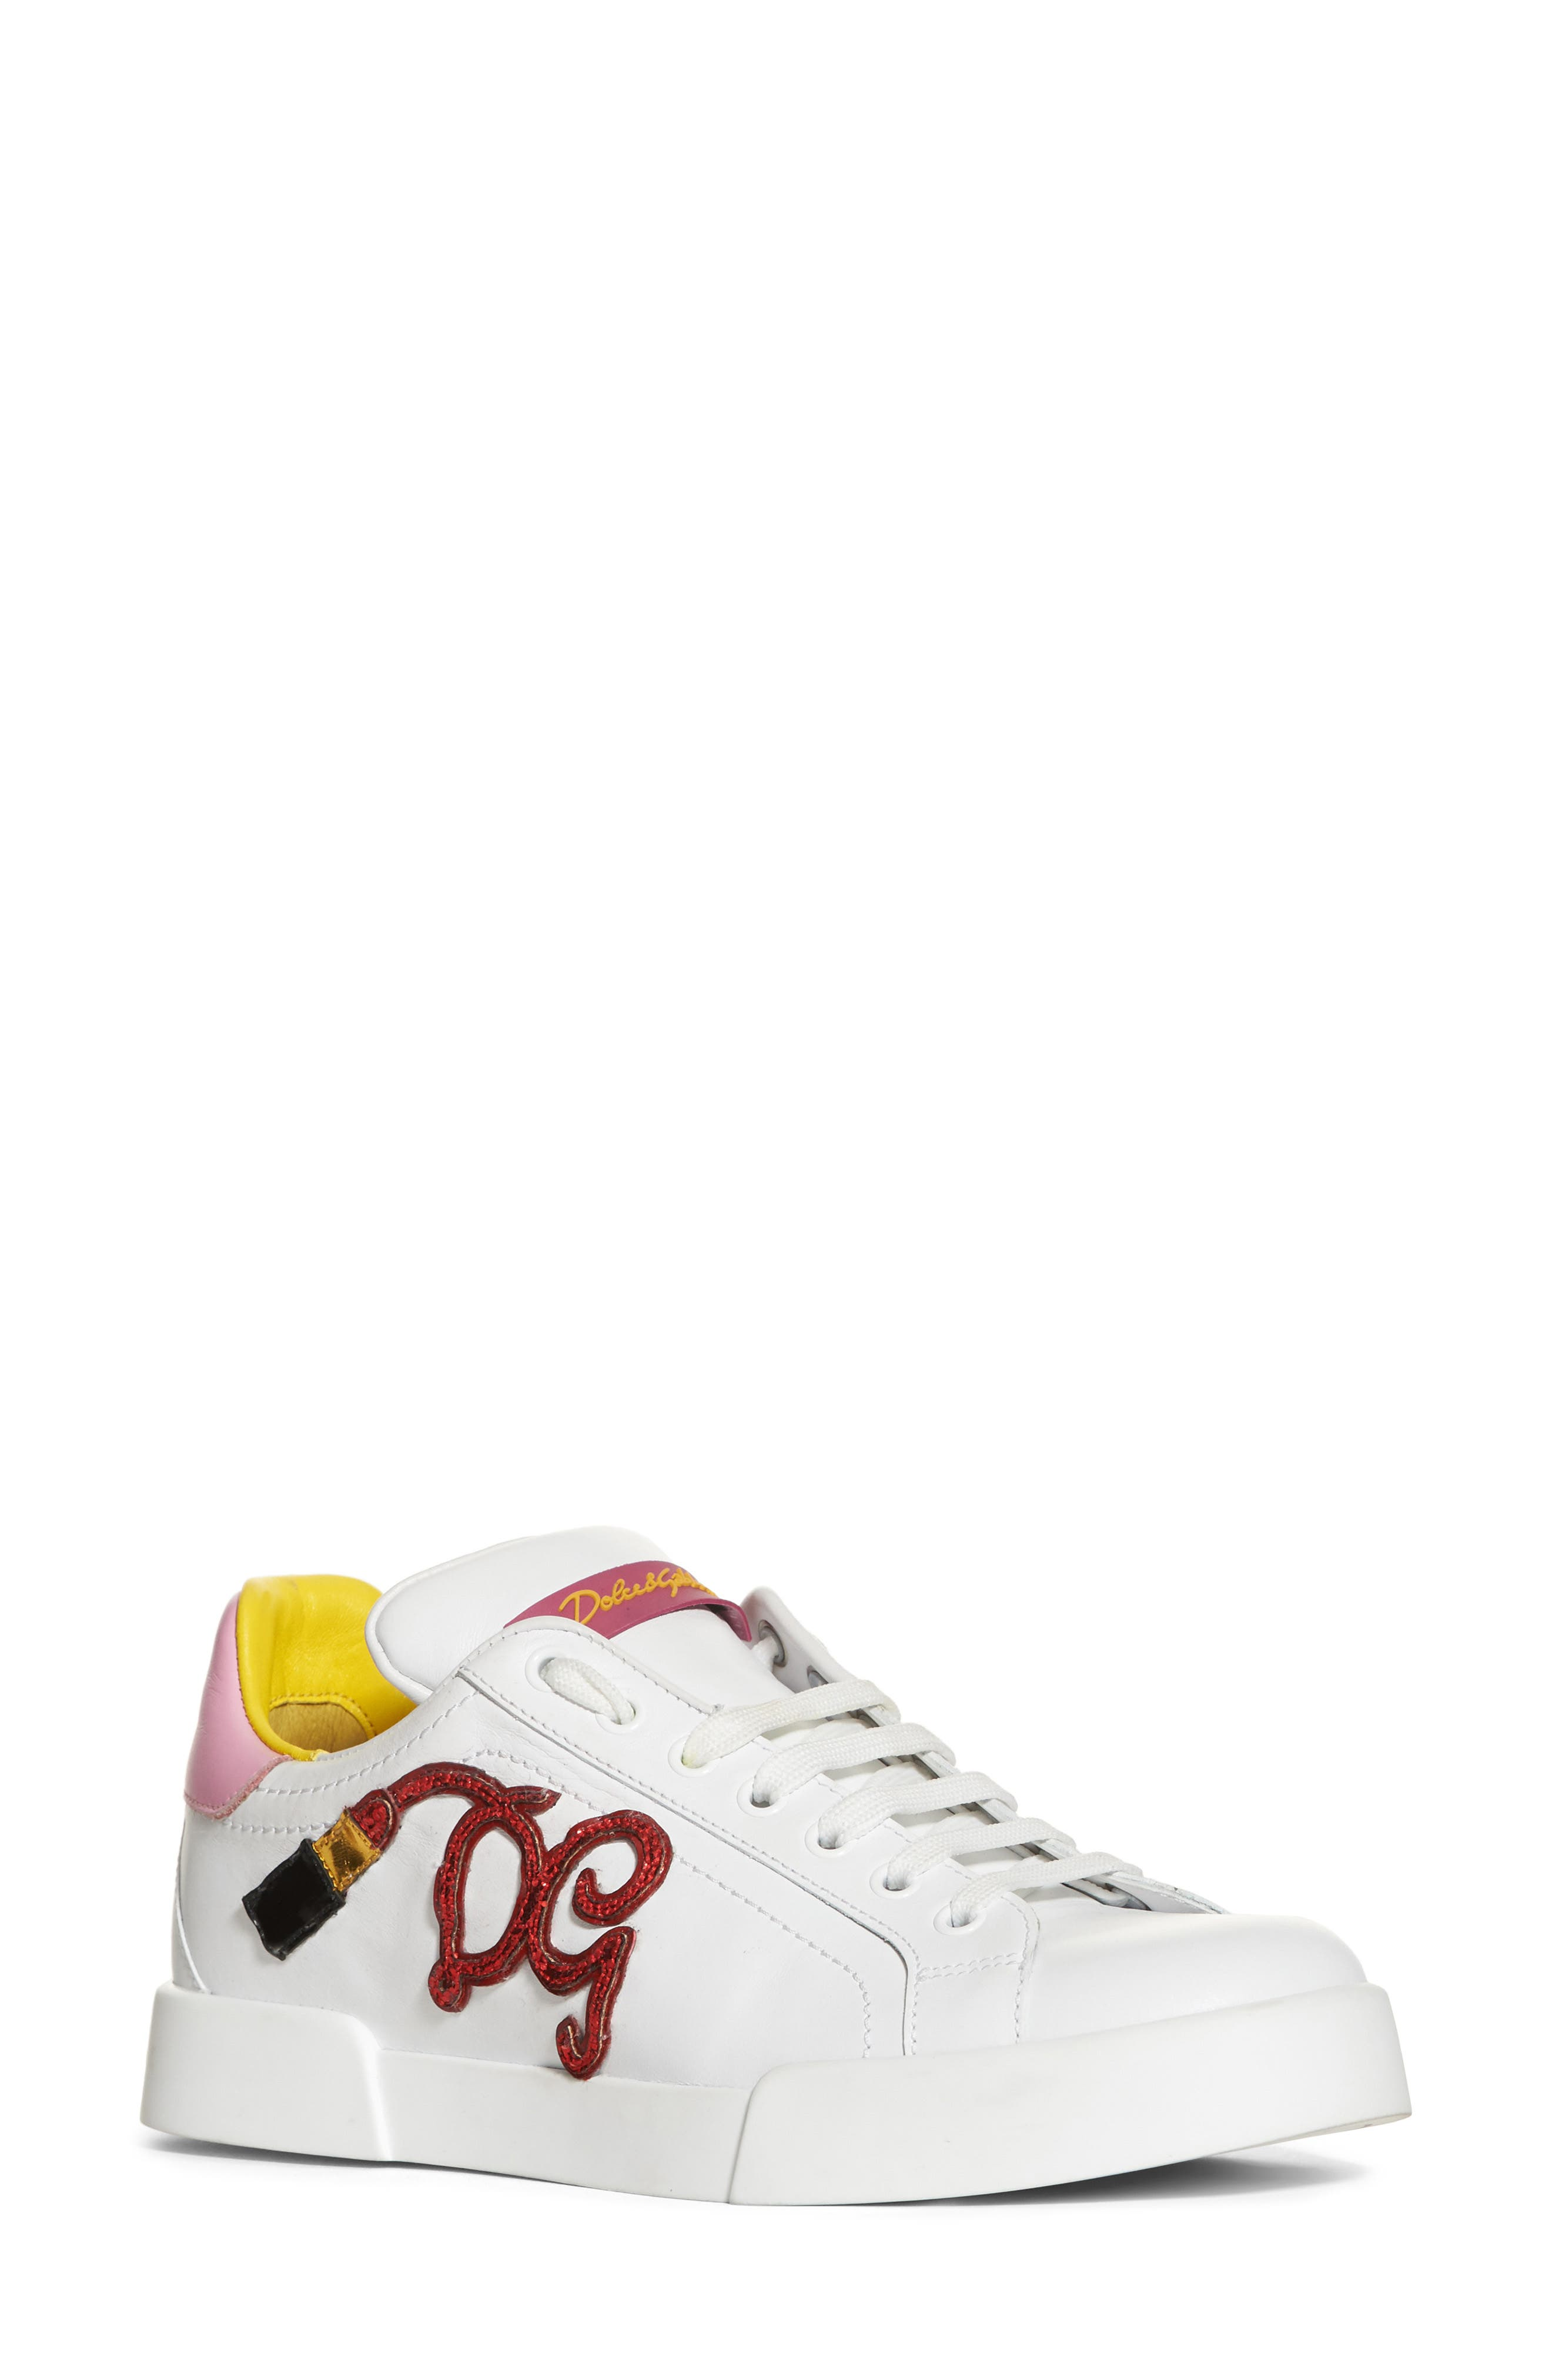 Dolce&Gabbana Lipstick Sneaker (Women)